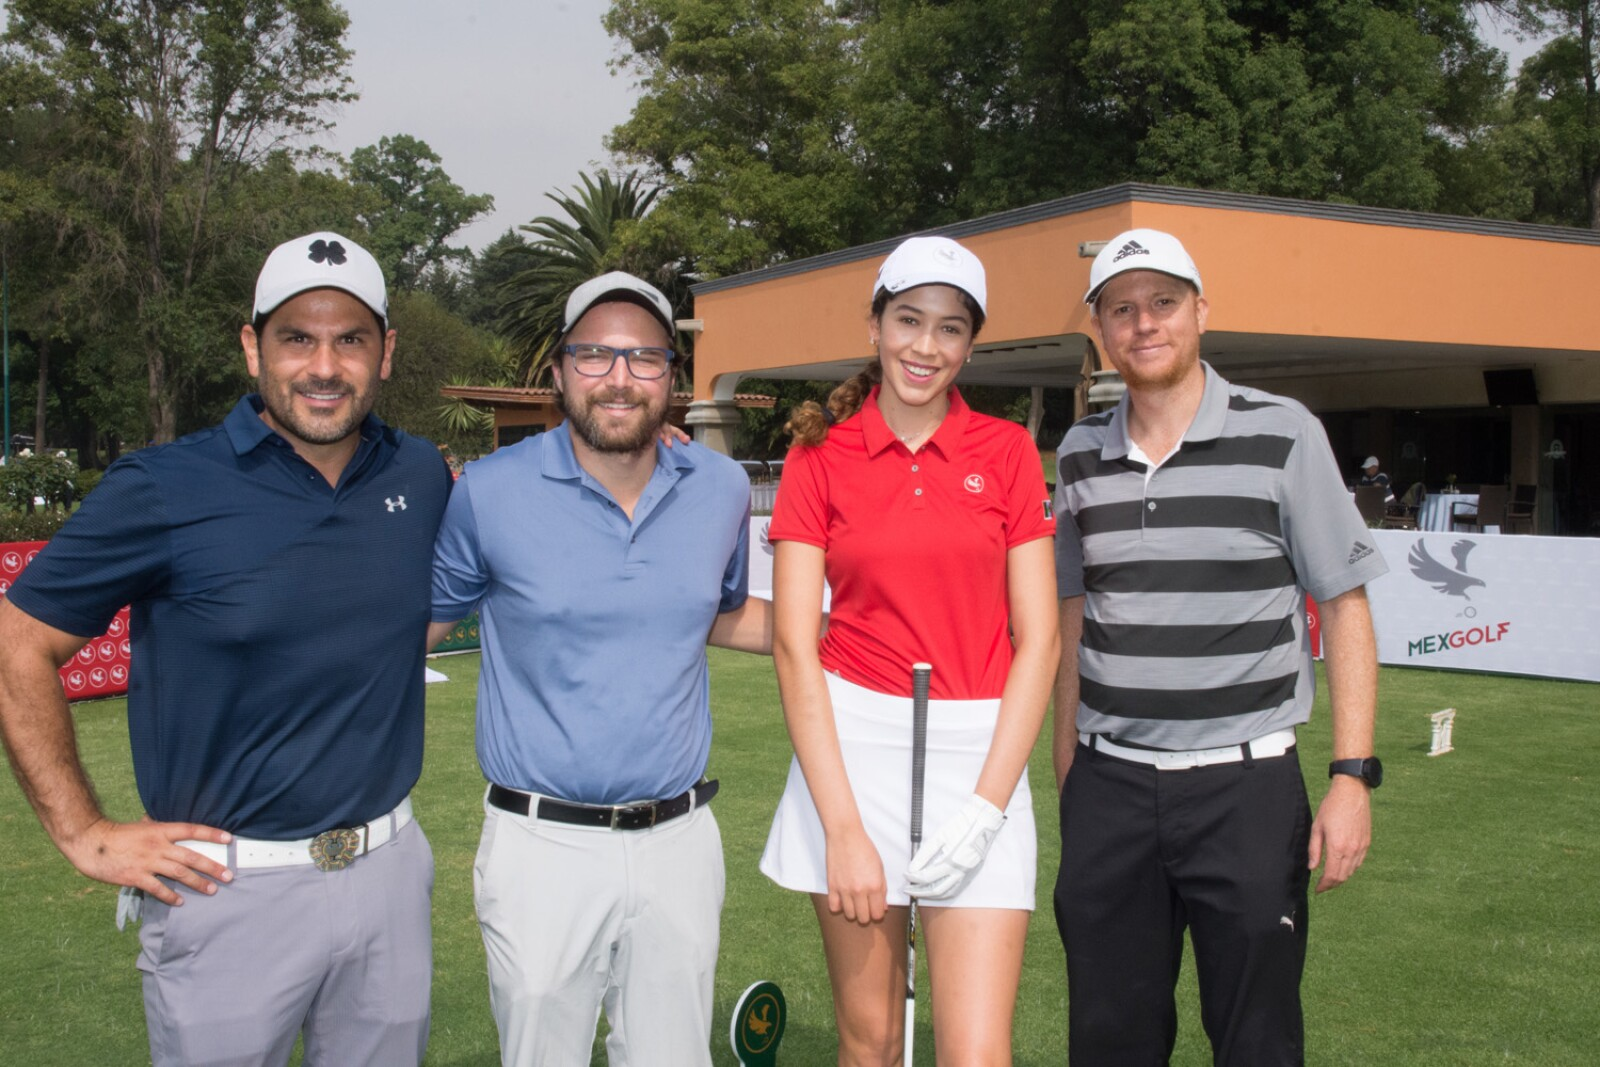 Oscar Martínez, Armando Loera, Paola Alonso y Eugenio Narezo.jpg